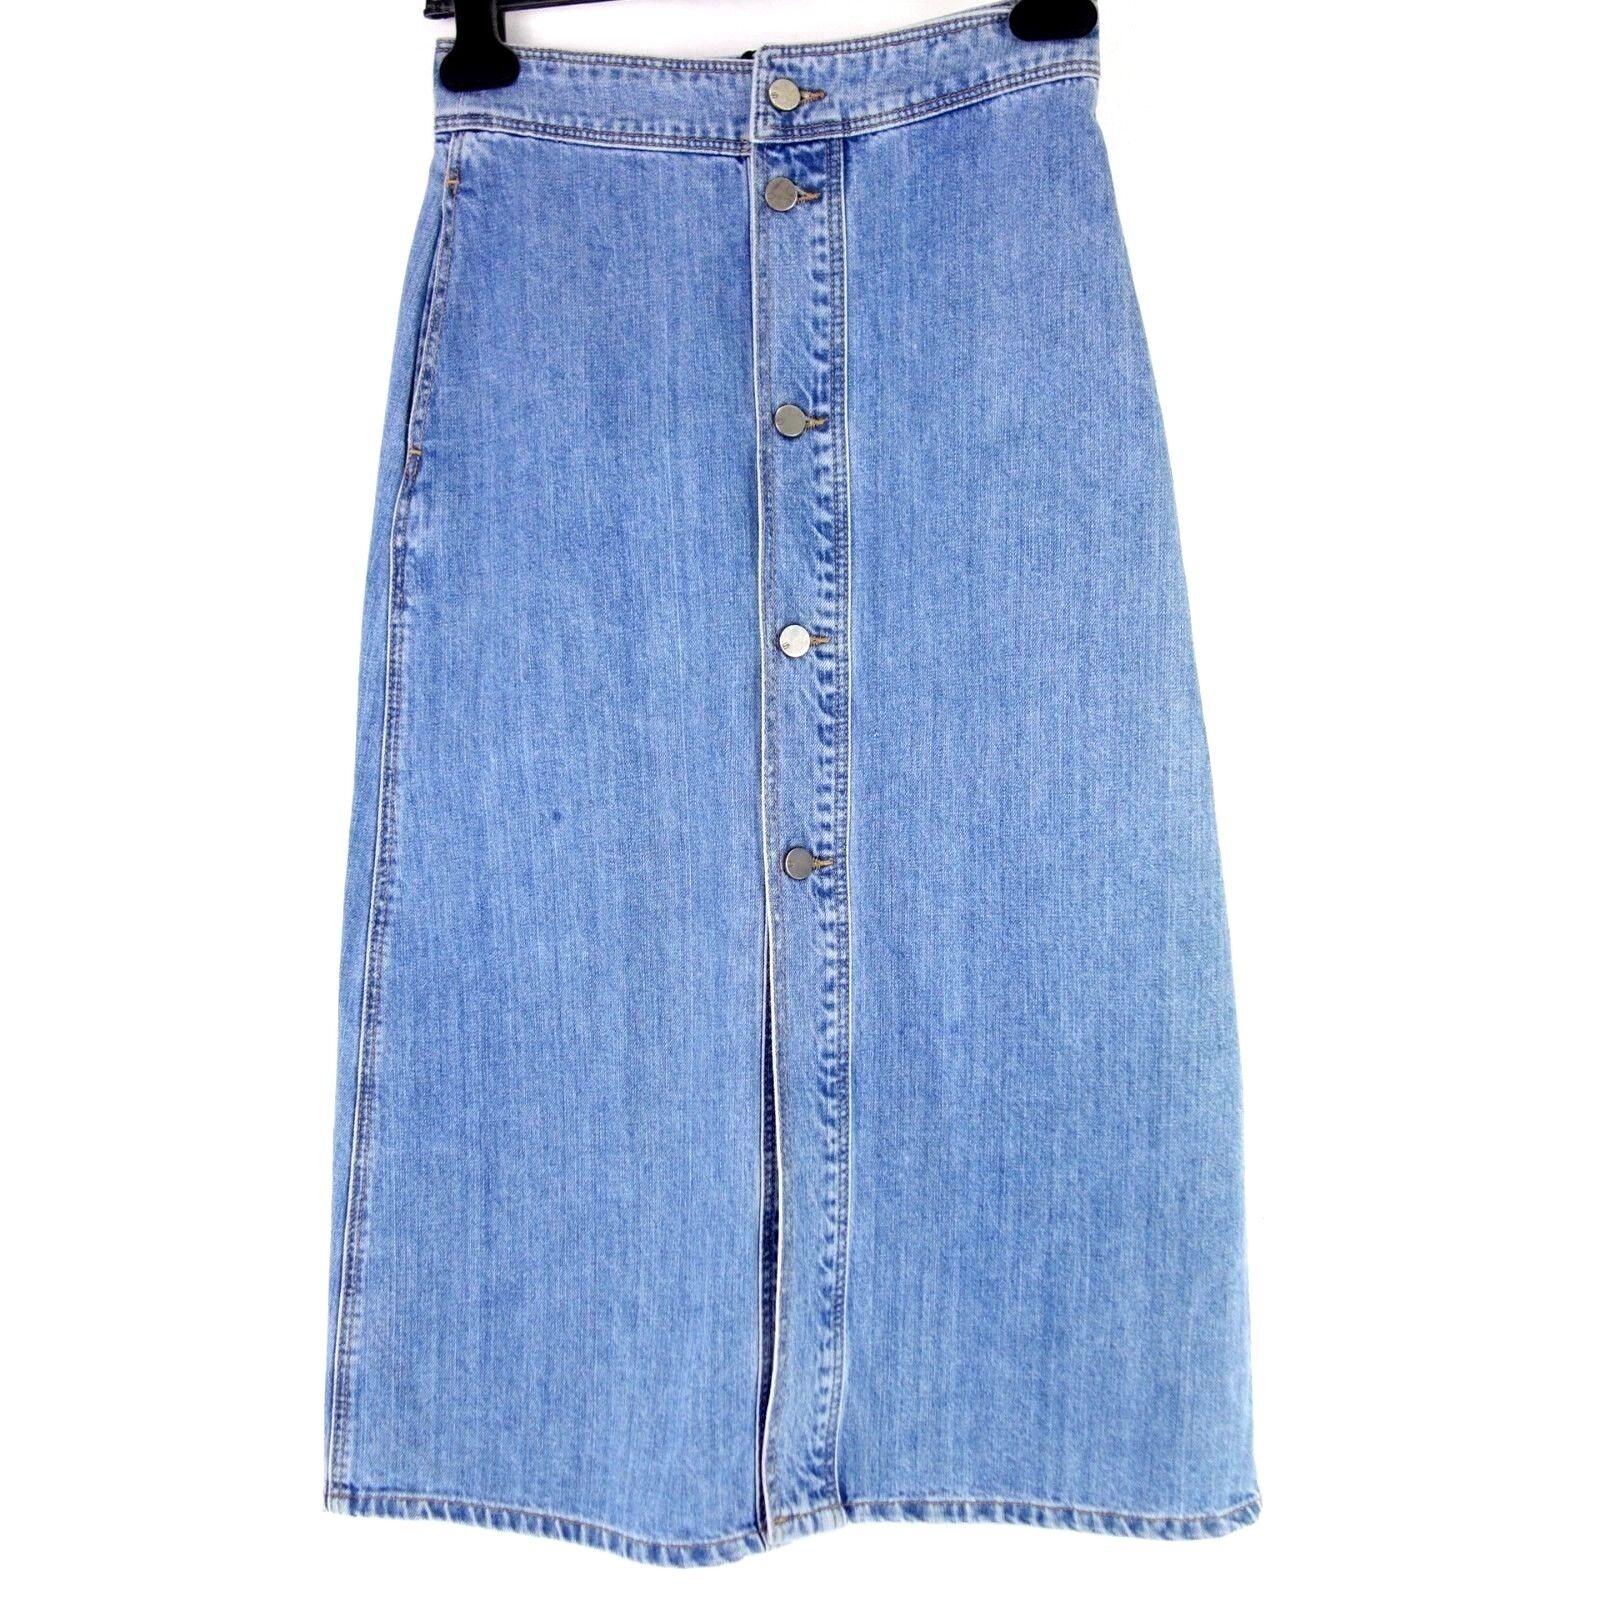 Set Ladies Skirt Gr 34 36 Cotton bluee Denim Mini Buttons Np 119 New